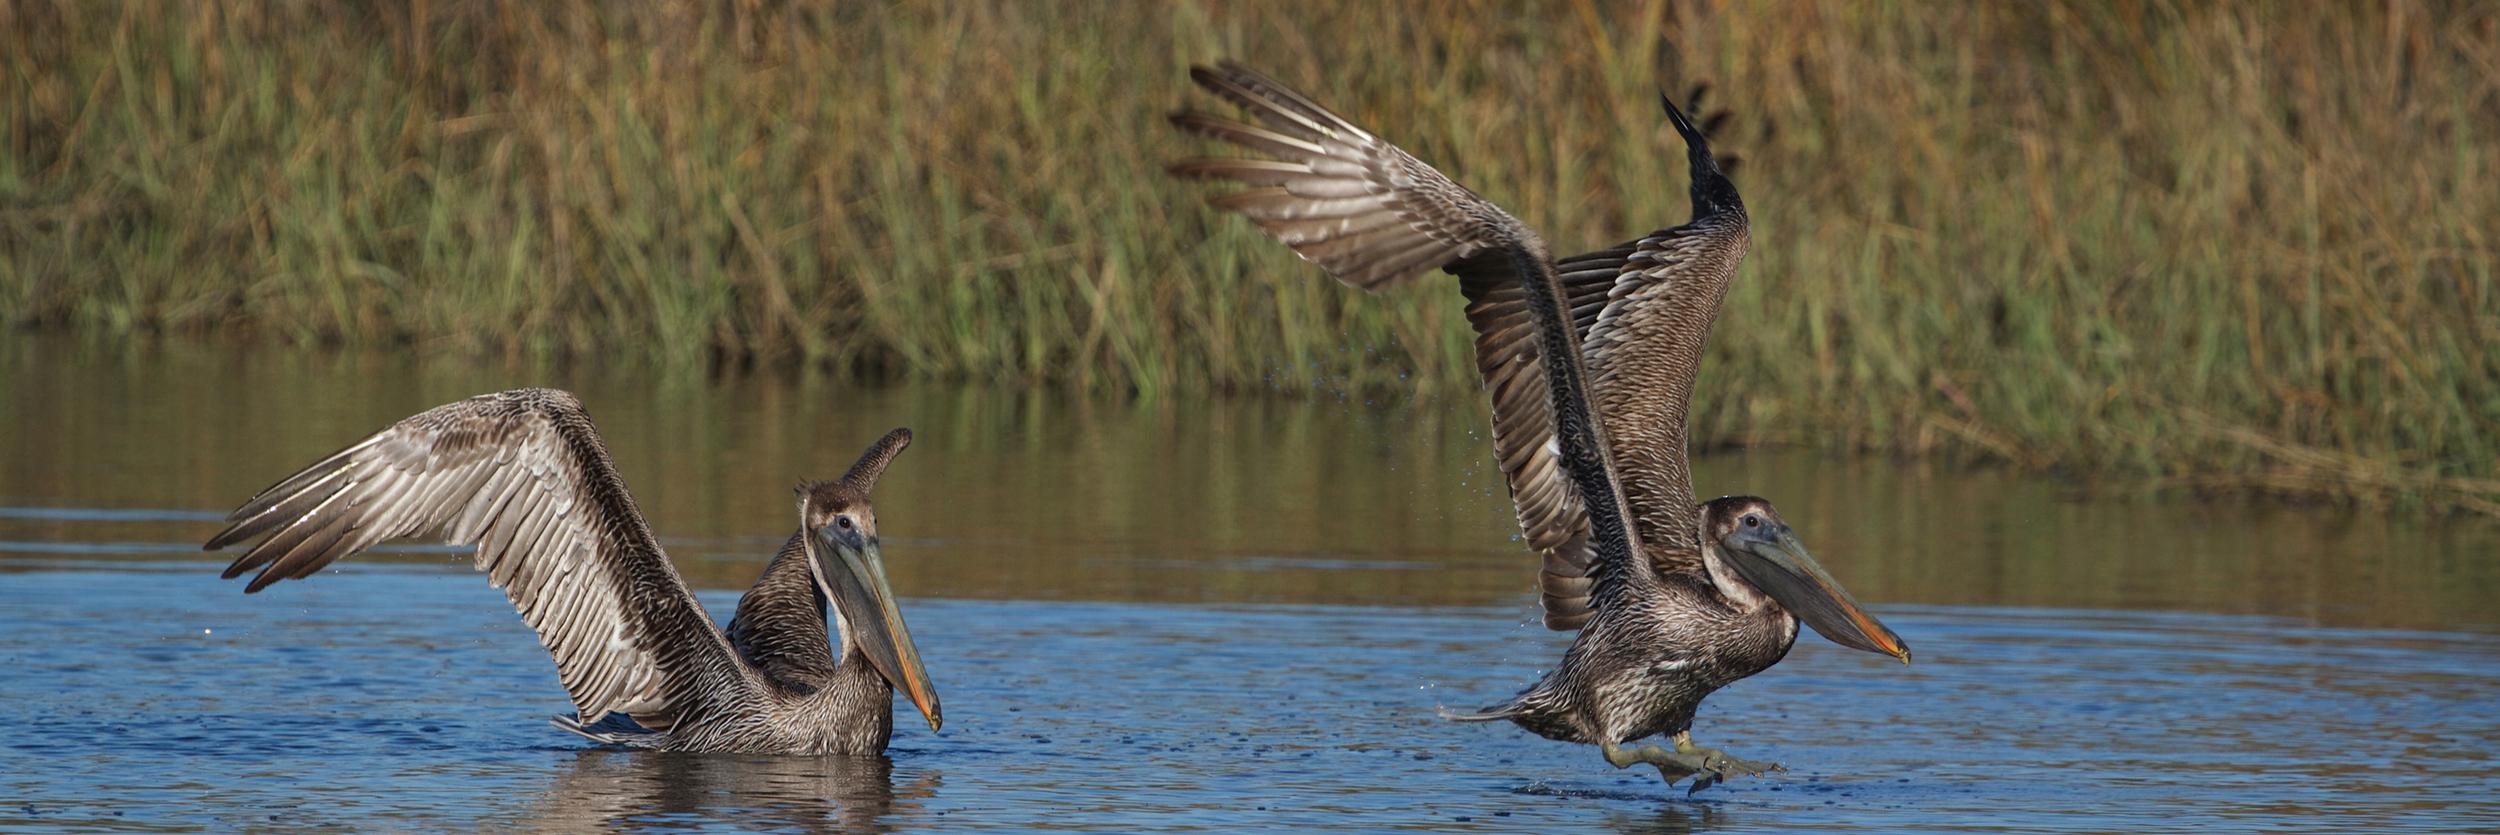 It is SPRING declares the Brown Pelican!